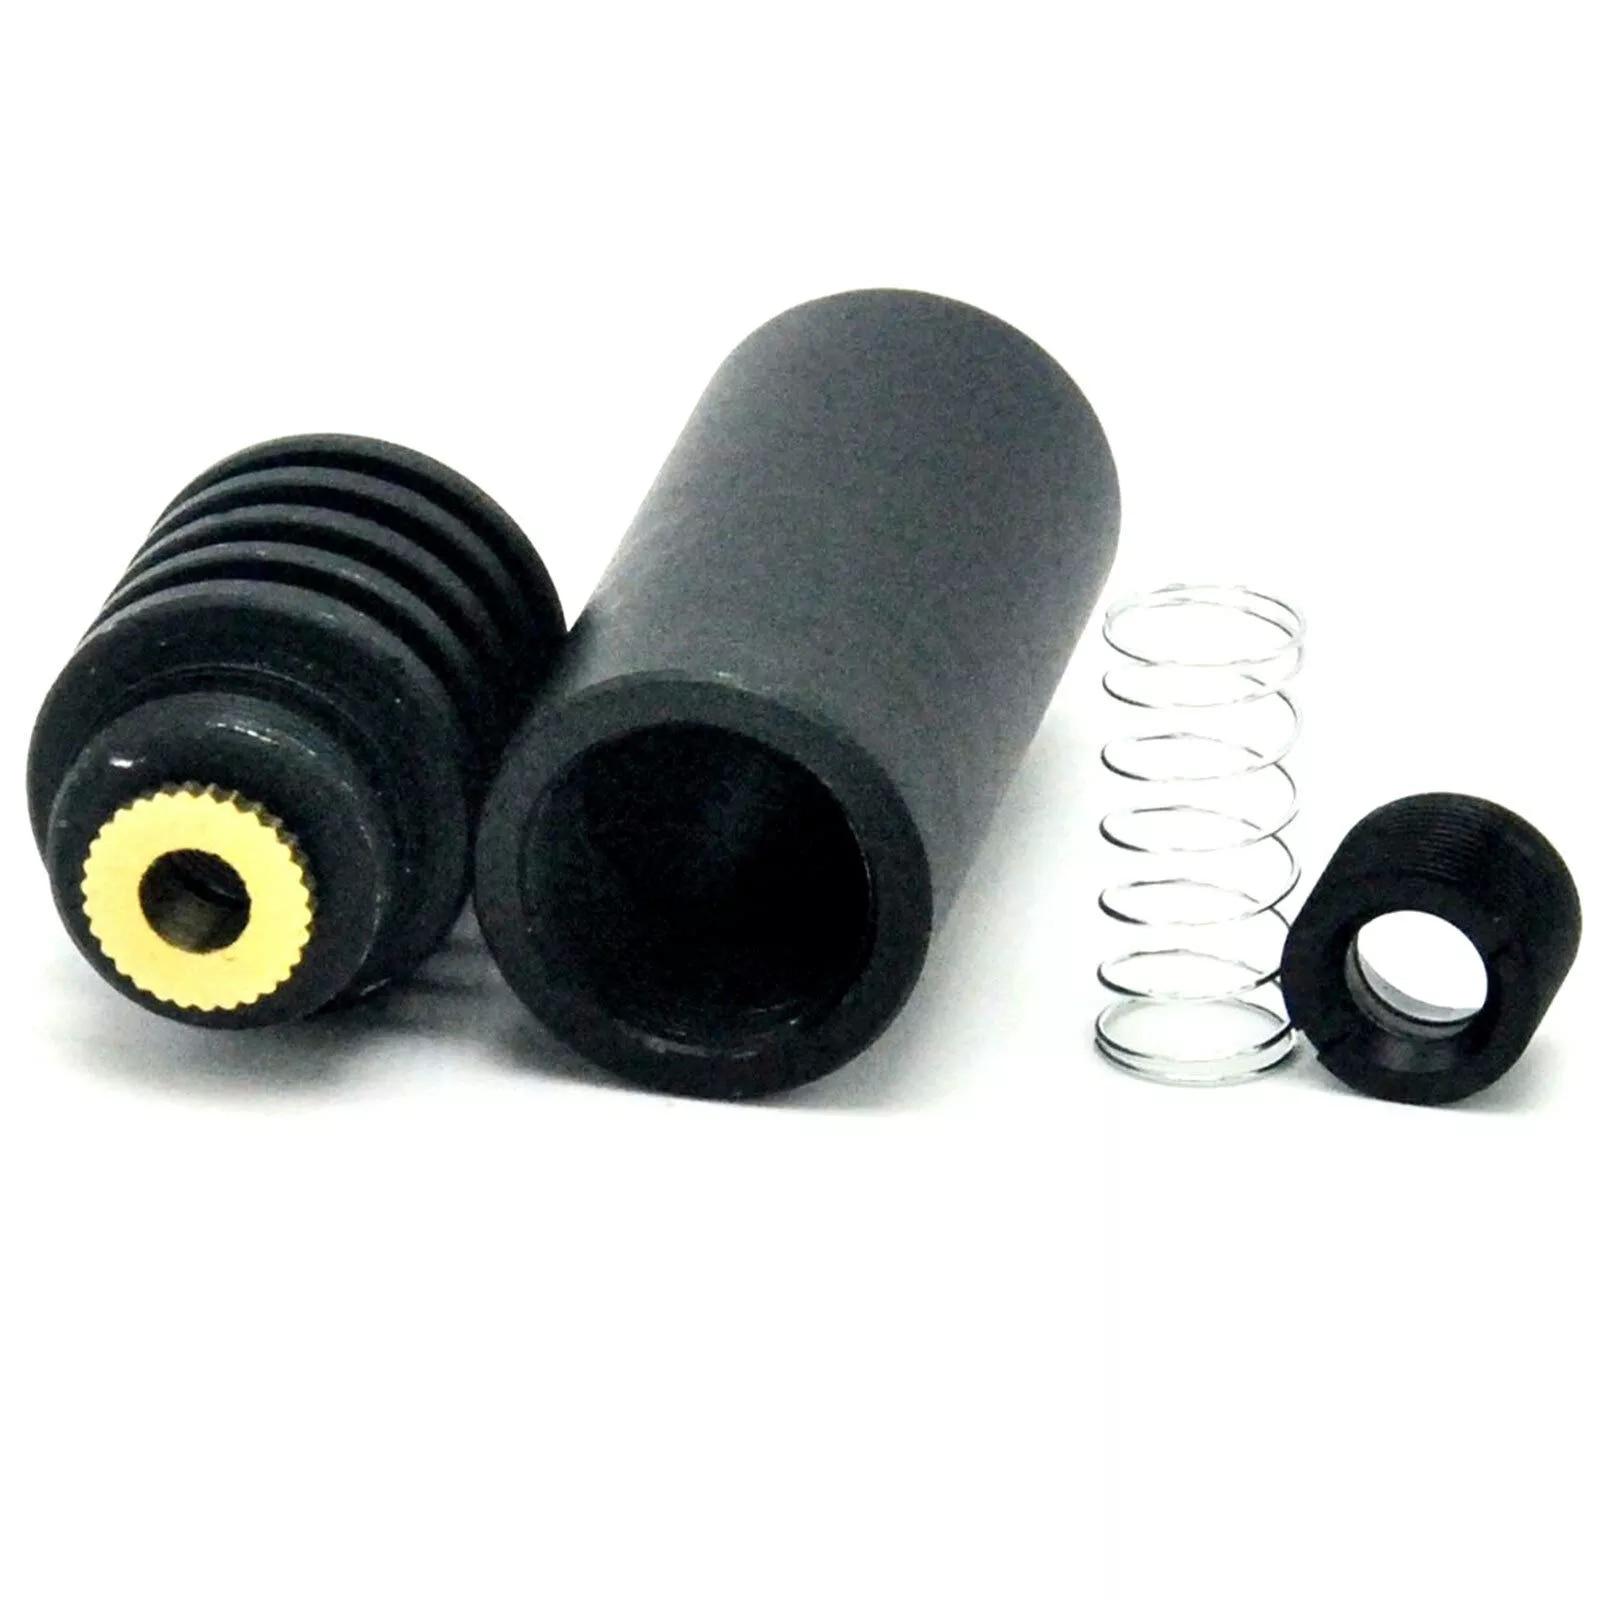 2 шт. Металл лазер диод хост для TO-18 5,6 мм LD DIY w 200 нм-1100 нм коллимирующий линзы 16x50 мм